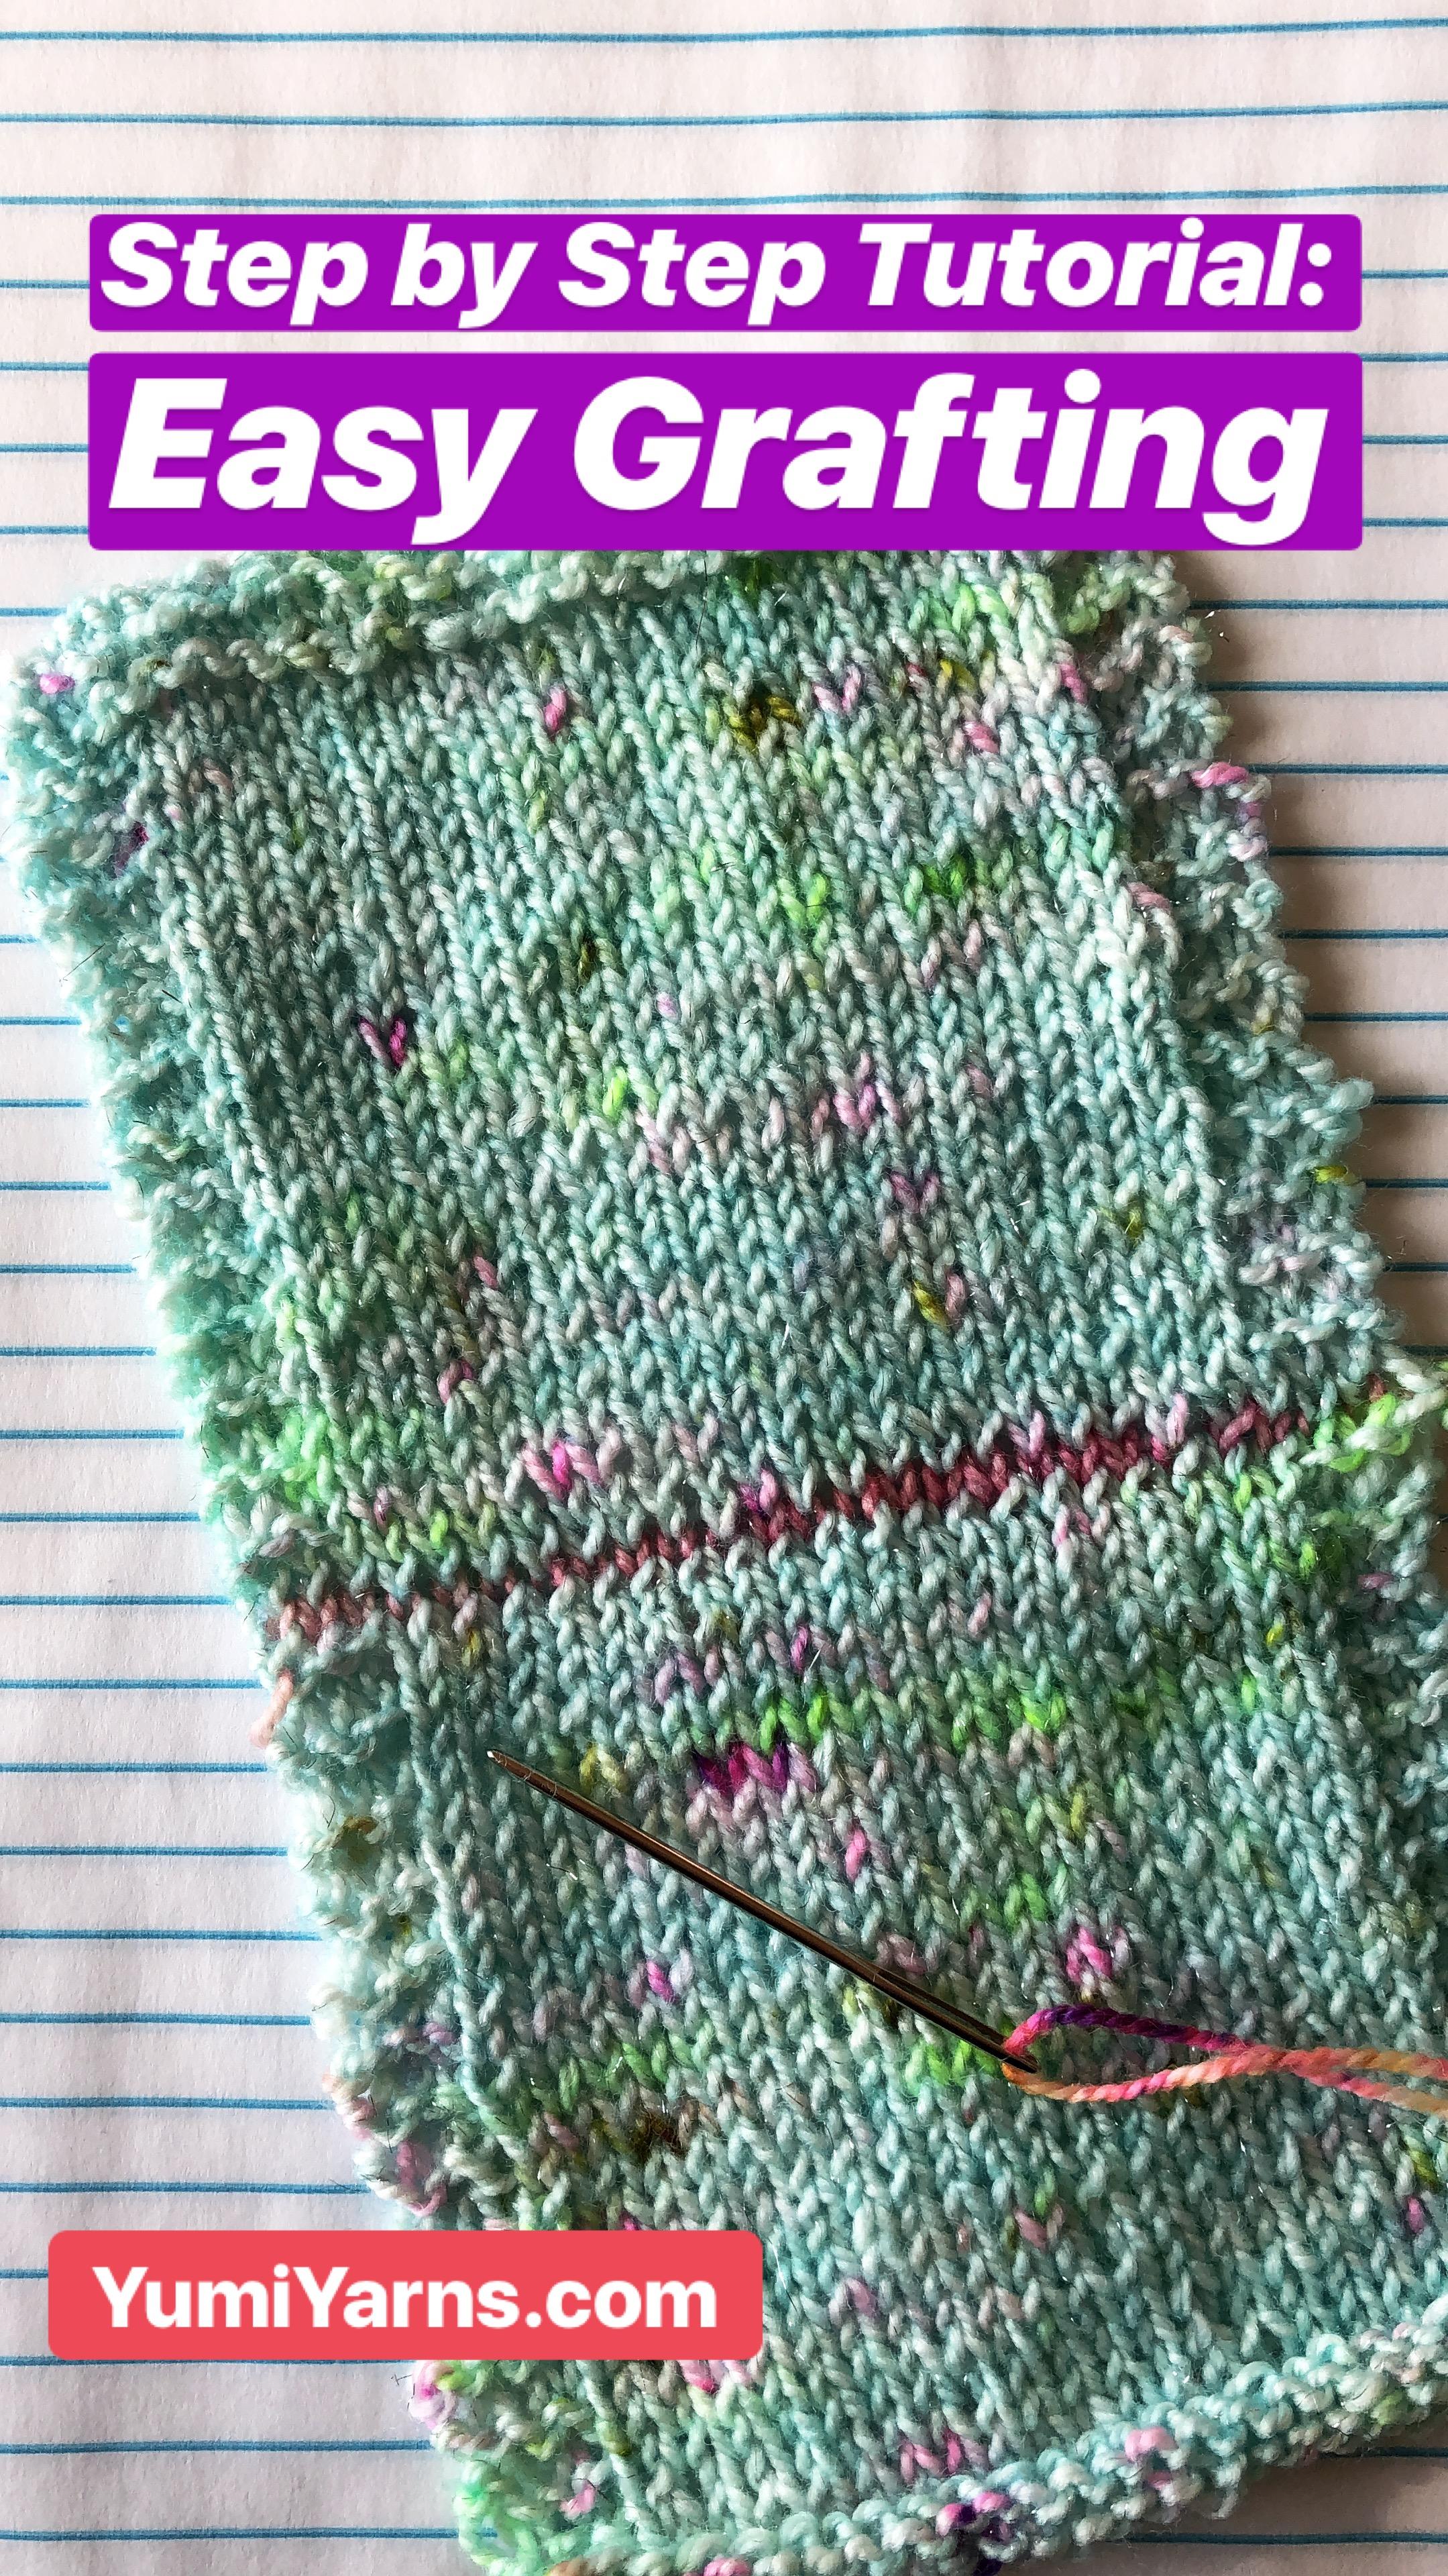 Tutorial: Easy Grafting/Kitchener Stitch | Yumi Yarns Knitting and ...